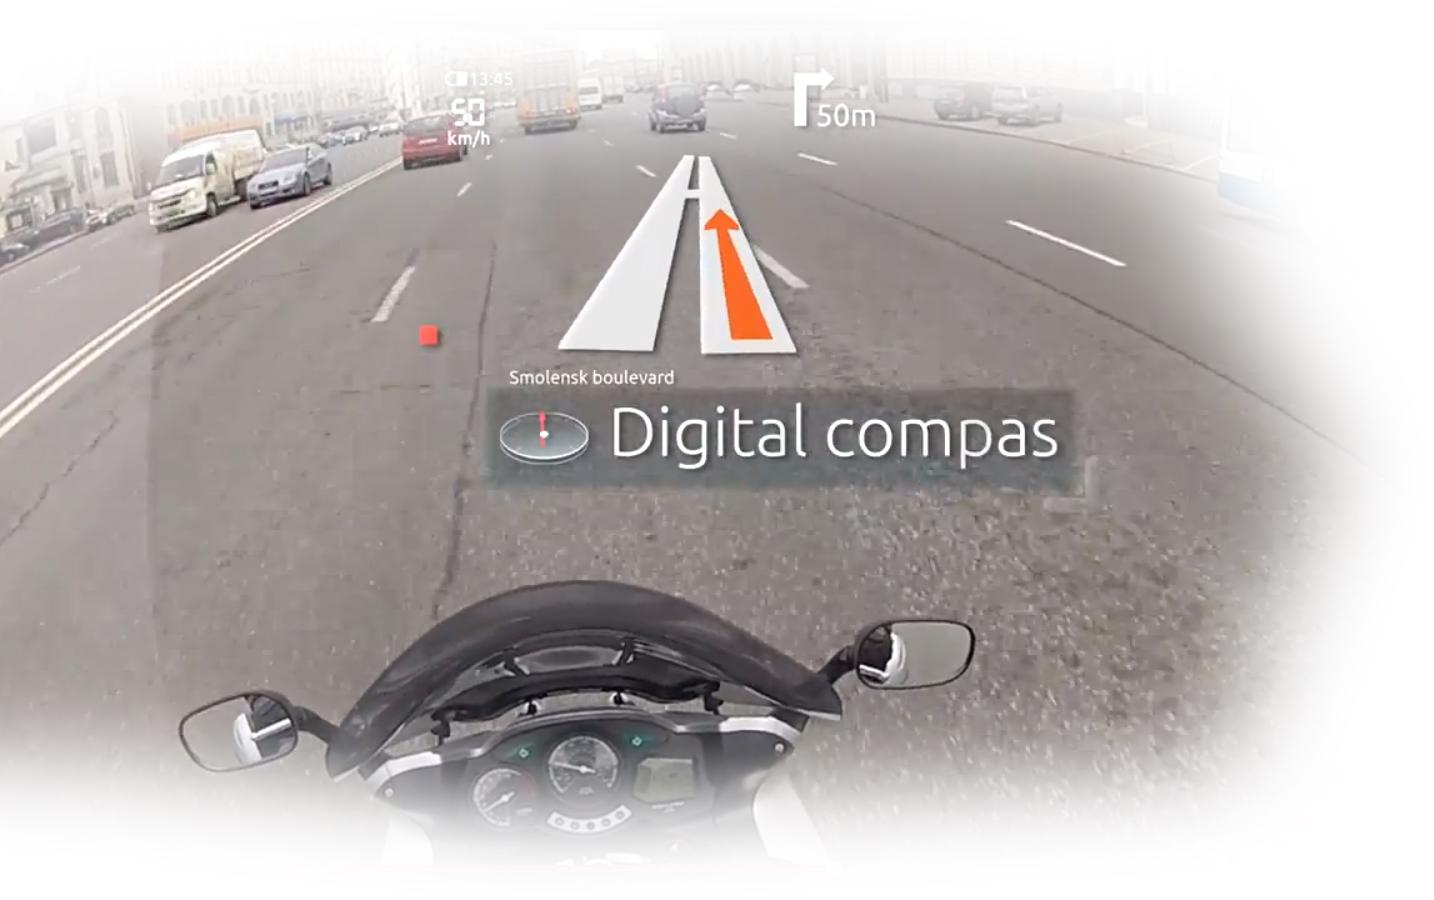 Вид из шлема мотоцикла